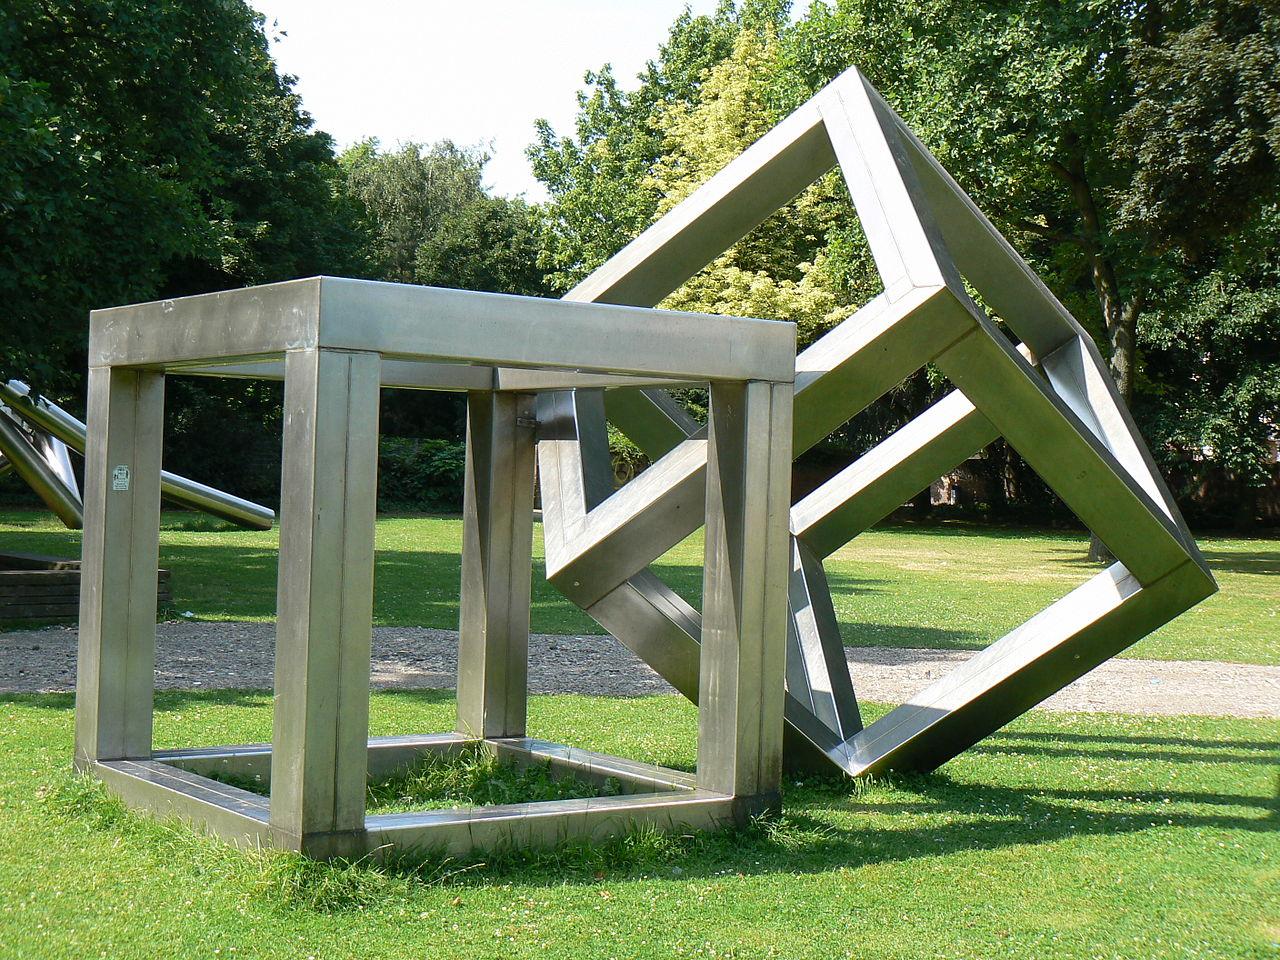 Bild Immanuel Kant Park Duisburg